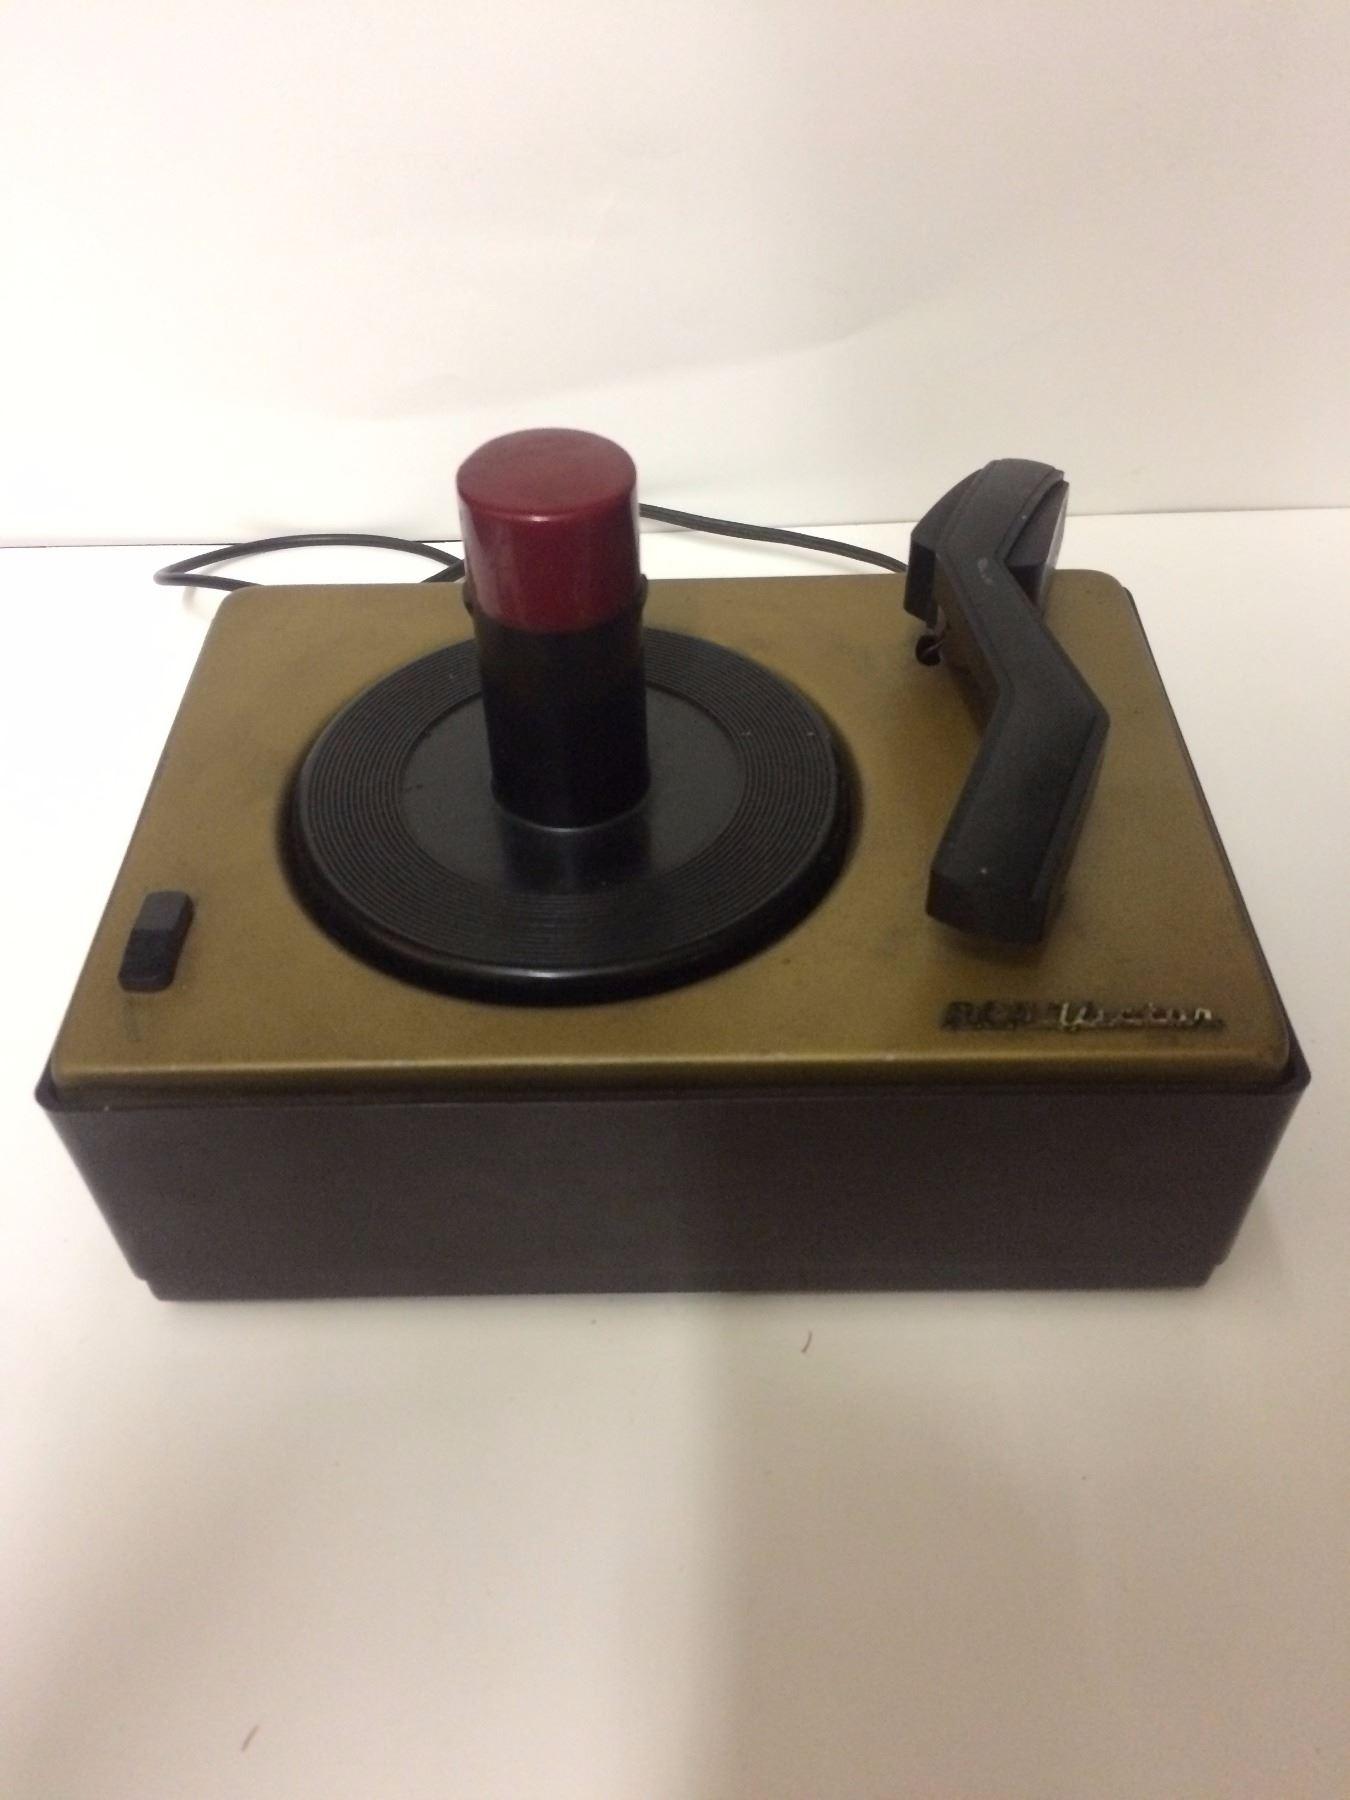 1949 RCA Victor Victrola Bakelite Table Top Record Player model 45-J 2